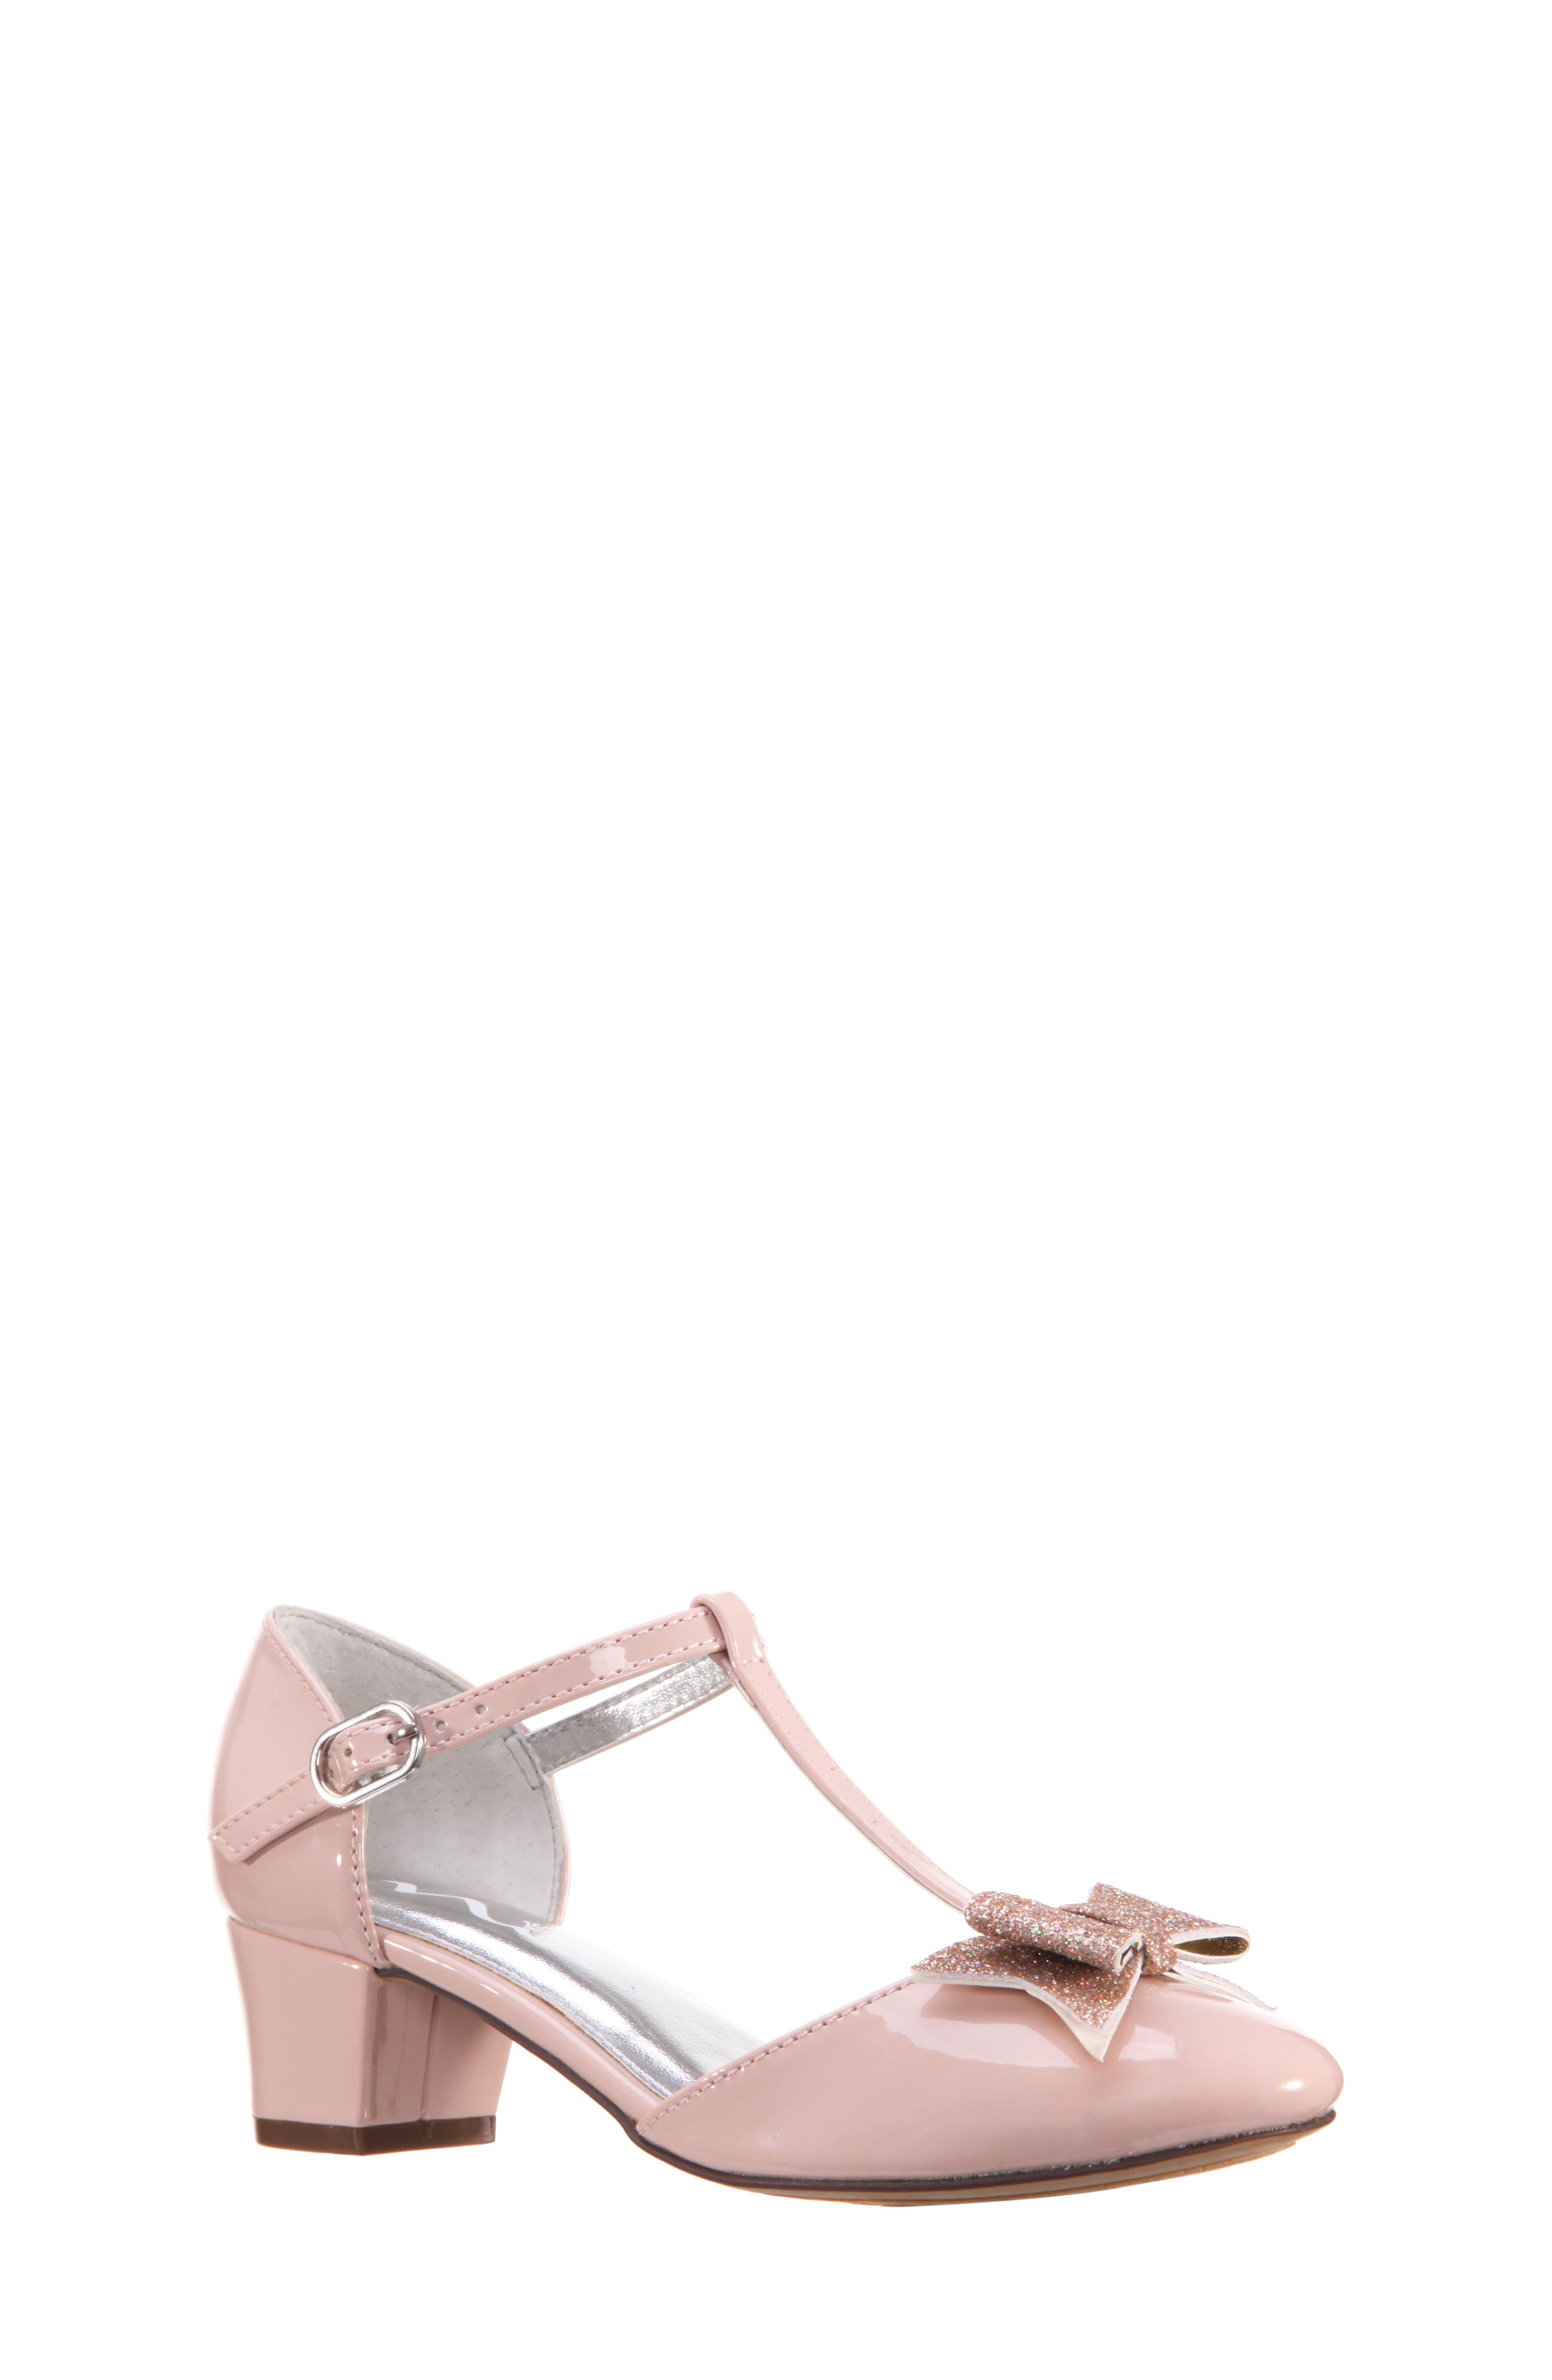 Marvette T-Strap Sandal,                         Main,                         color, BLUSH PATENT